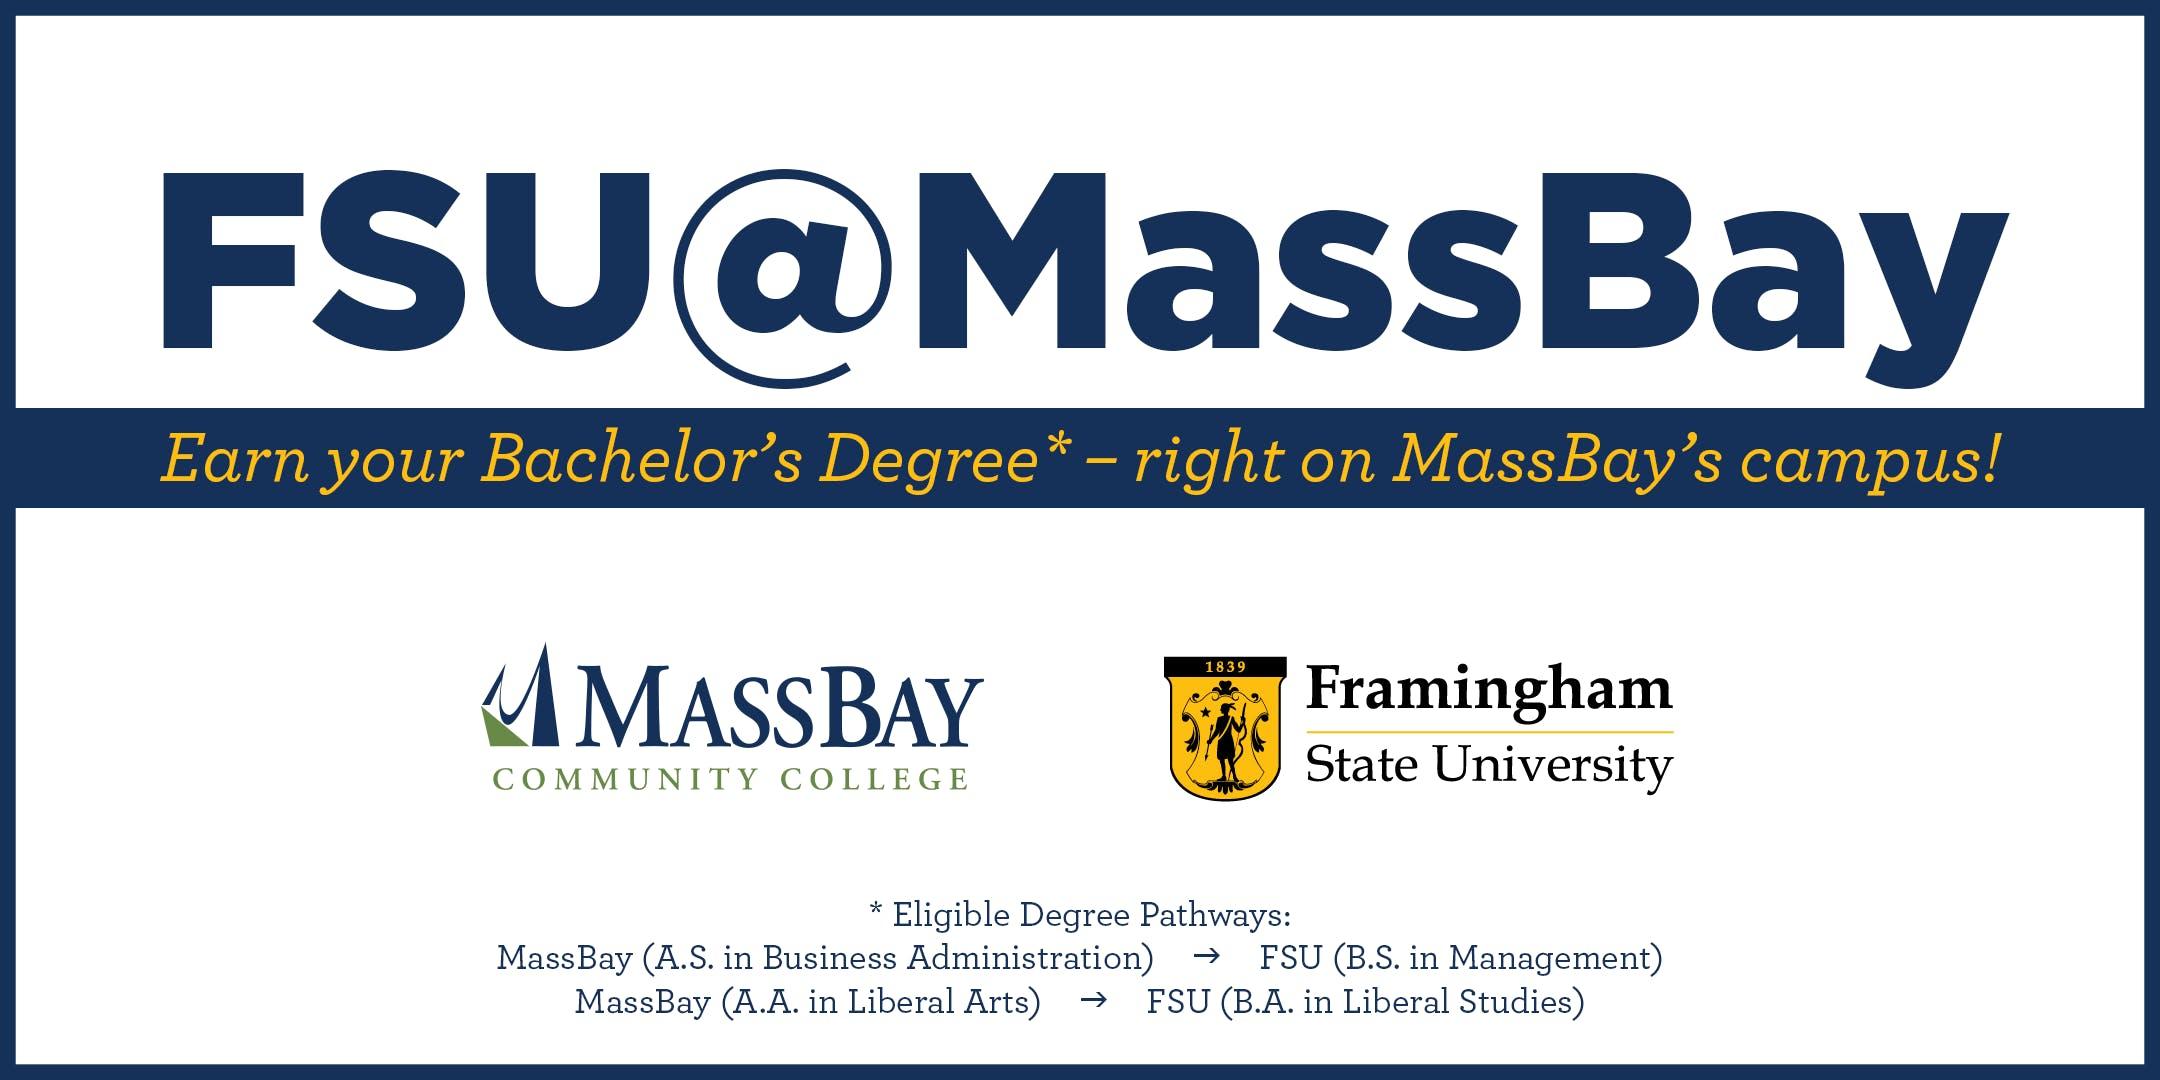 FSU@MassBay Information Session